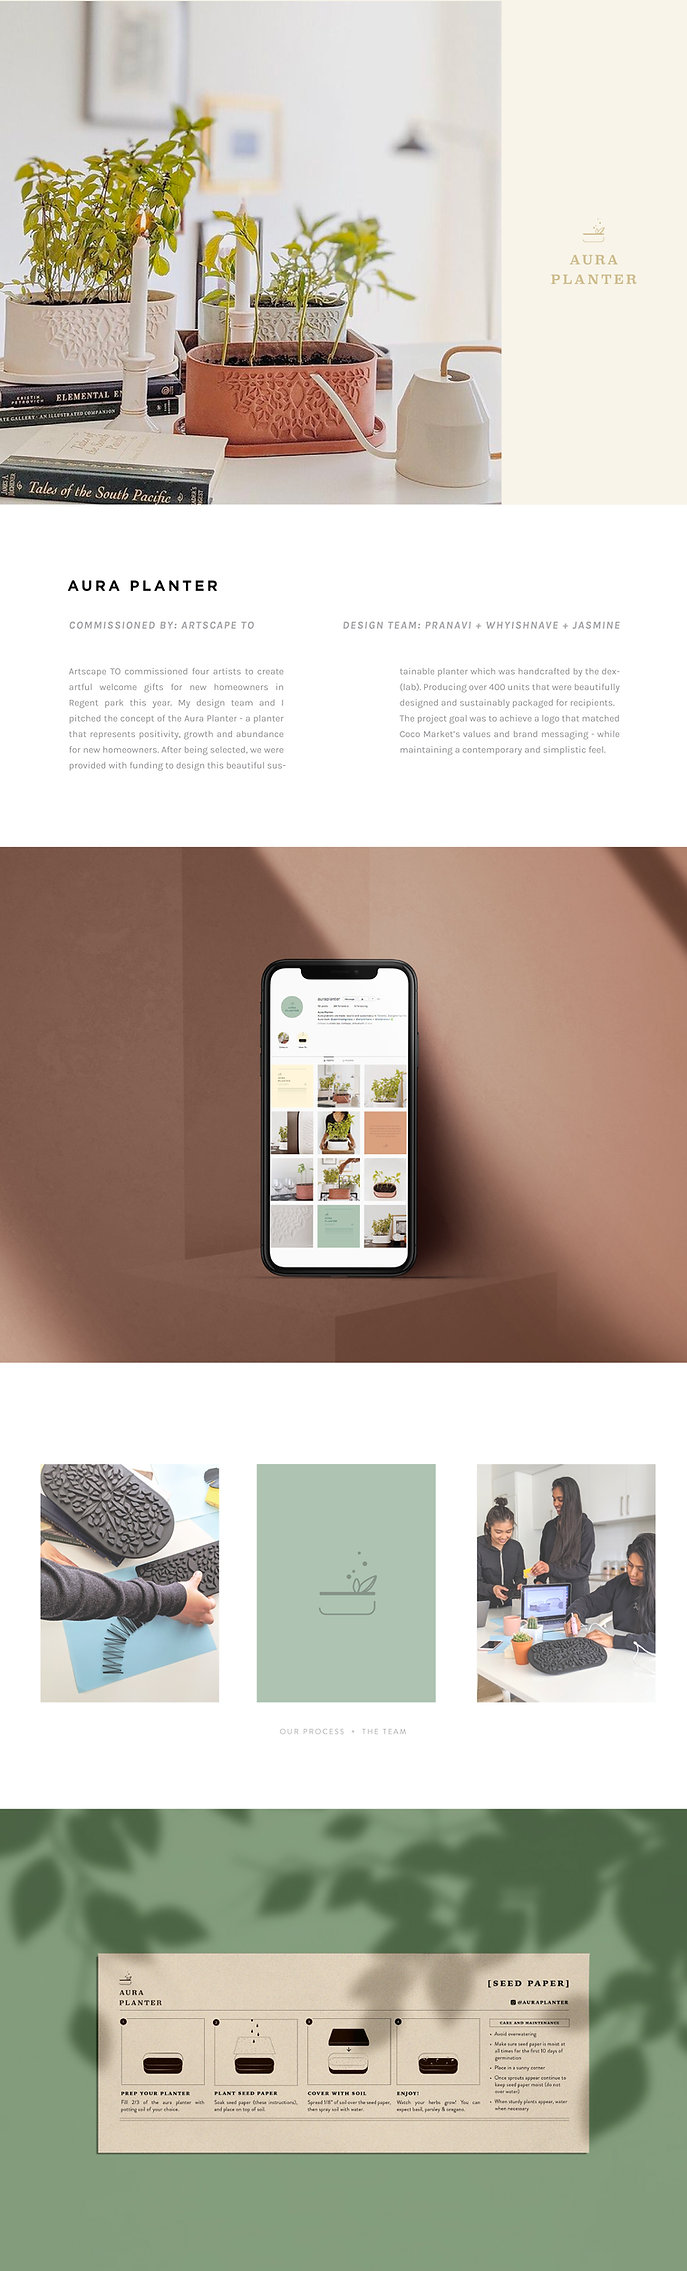 Aura-Planter-portfolio.jpg